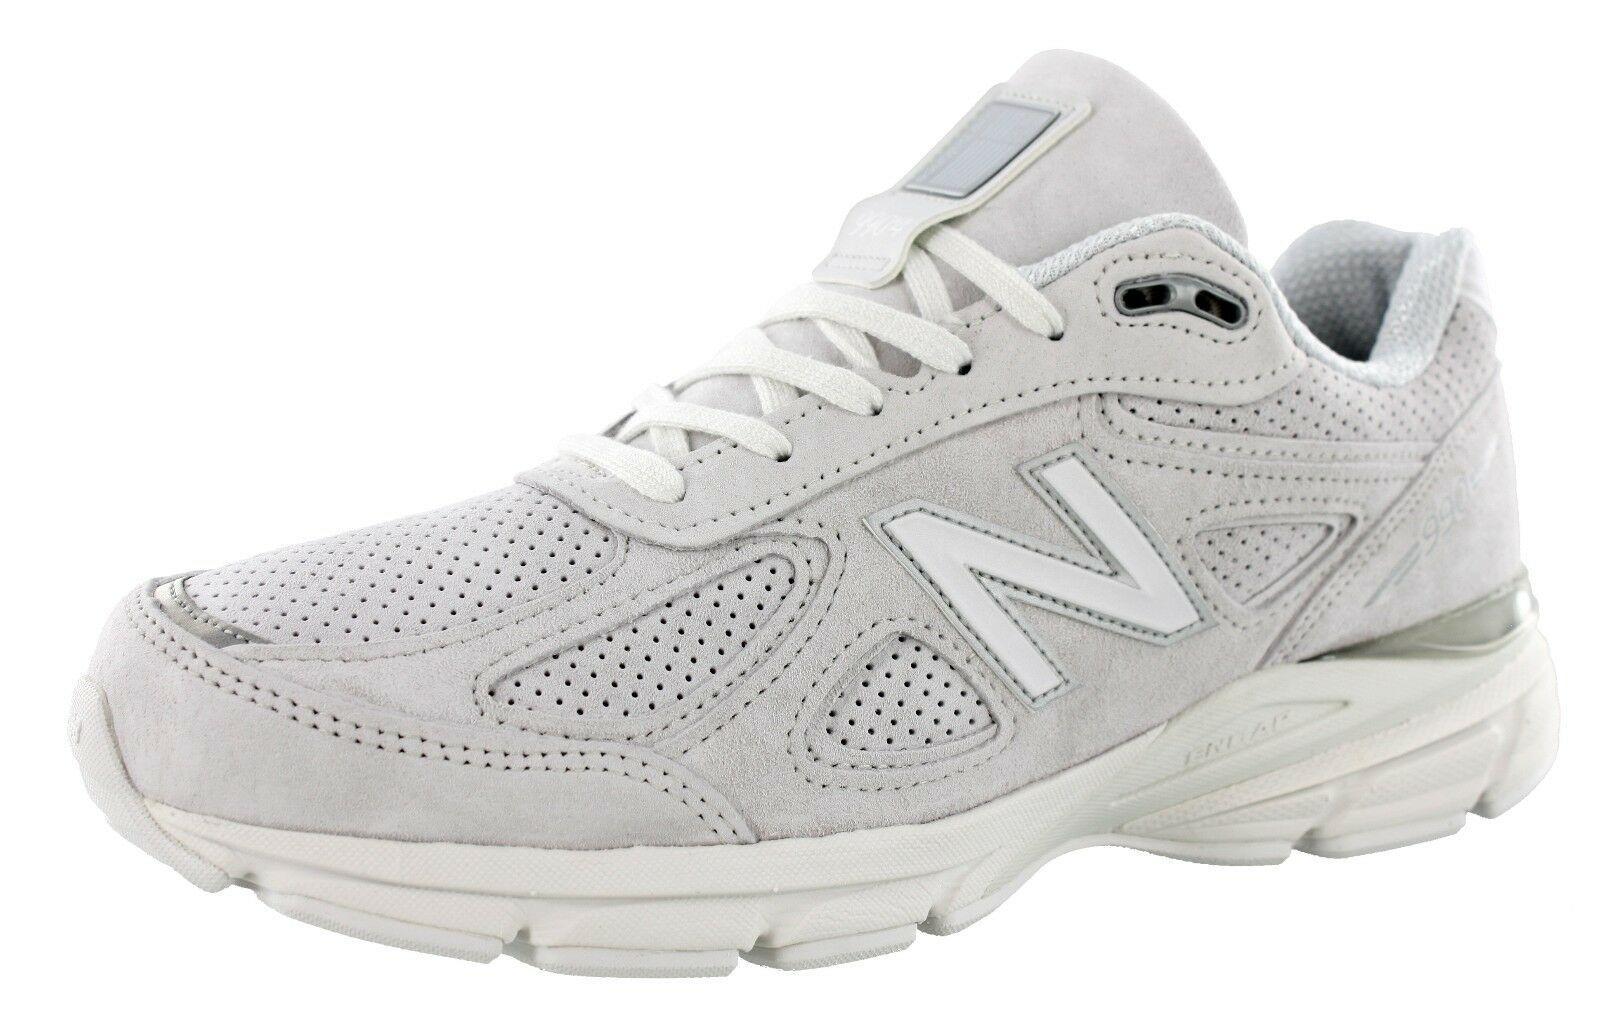 Cross training shoes